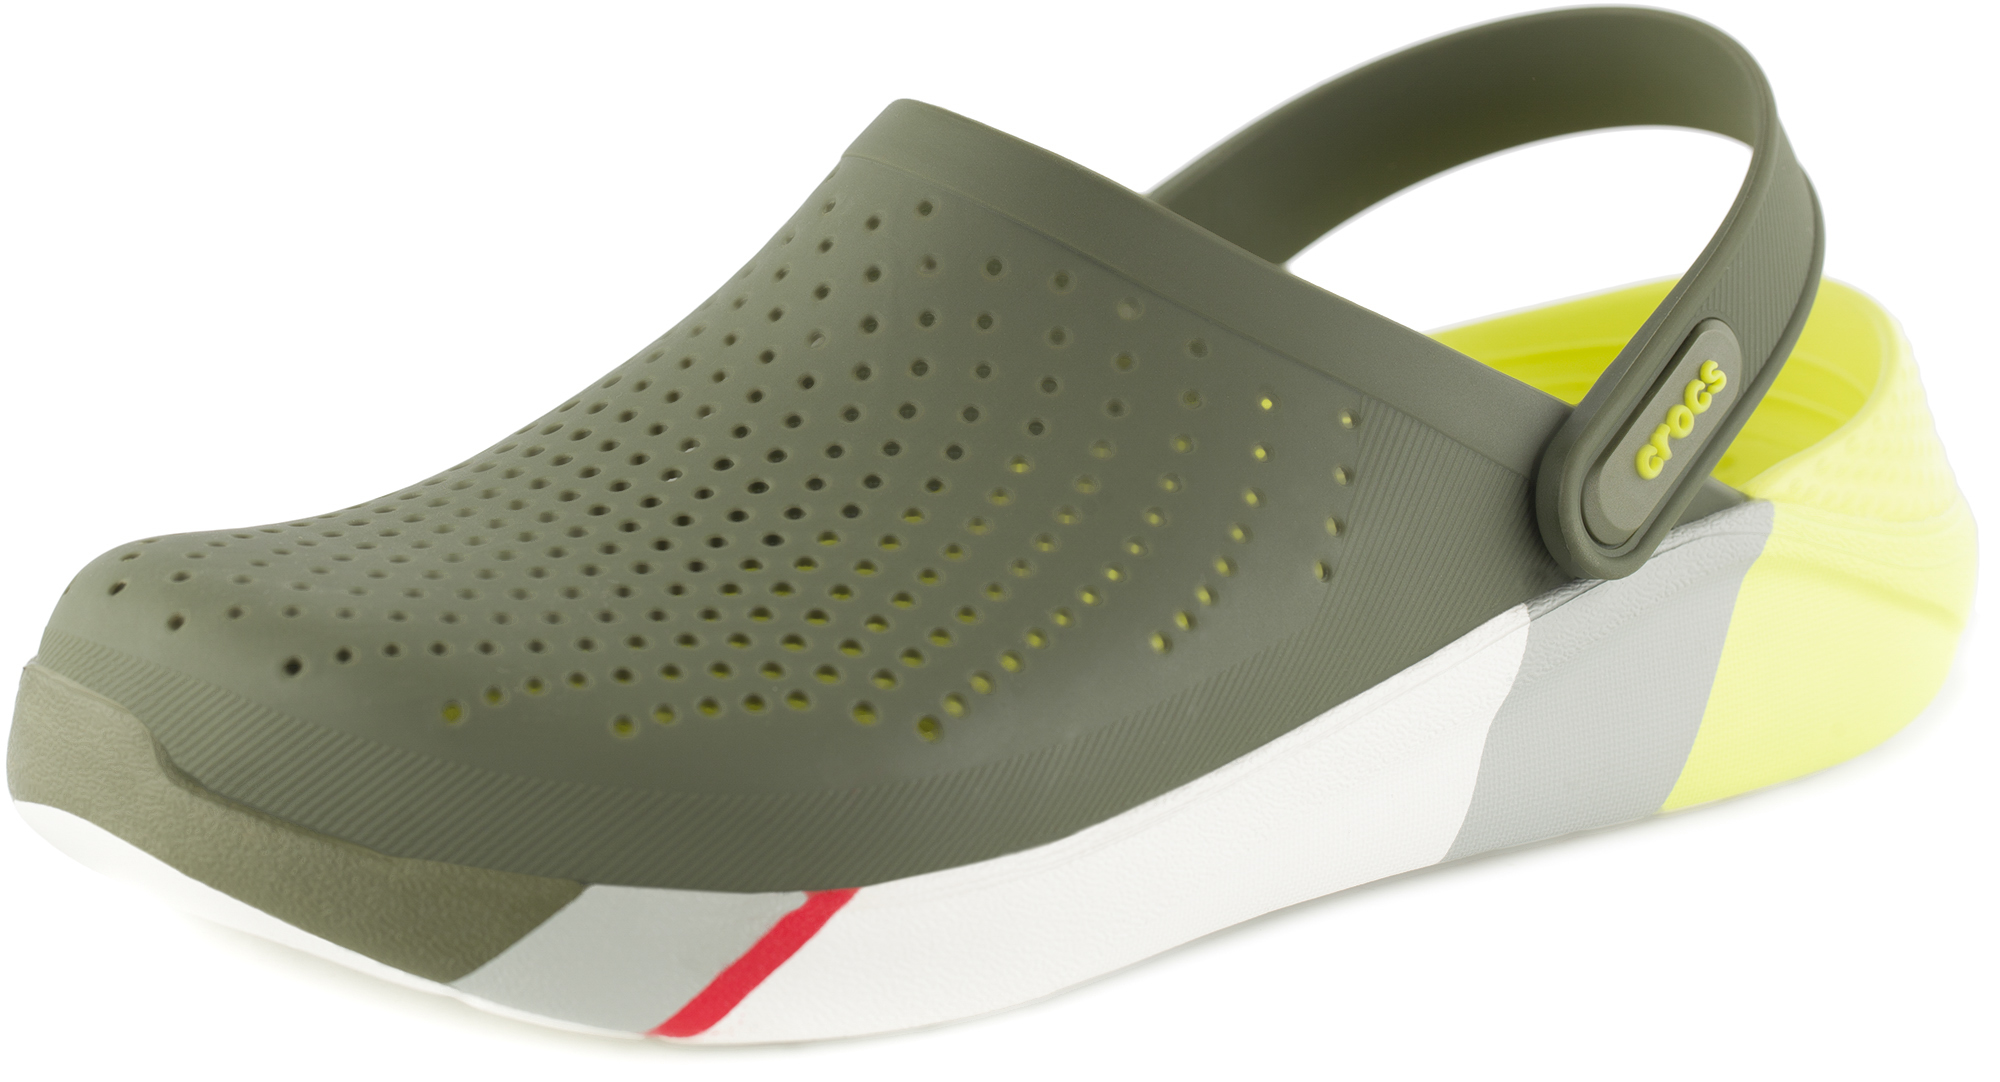 Crocs Шлепанцы Crocs LiteRide Colorblock, размер 44-45 colorblock